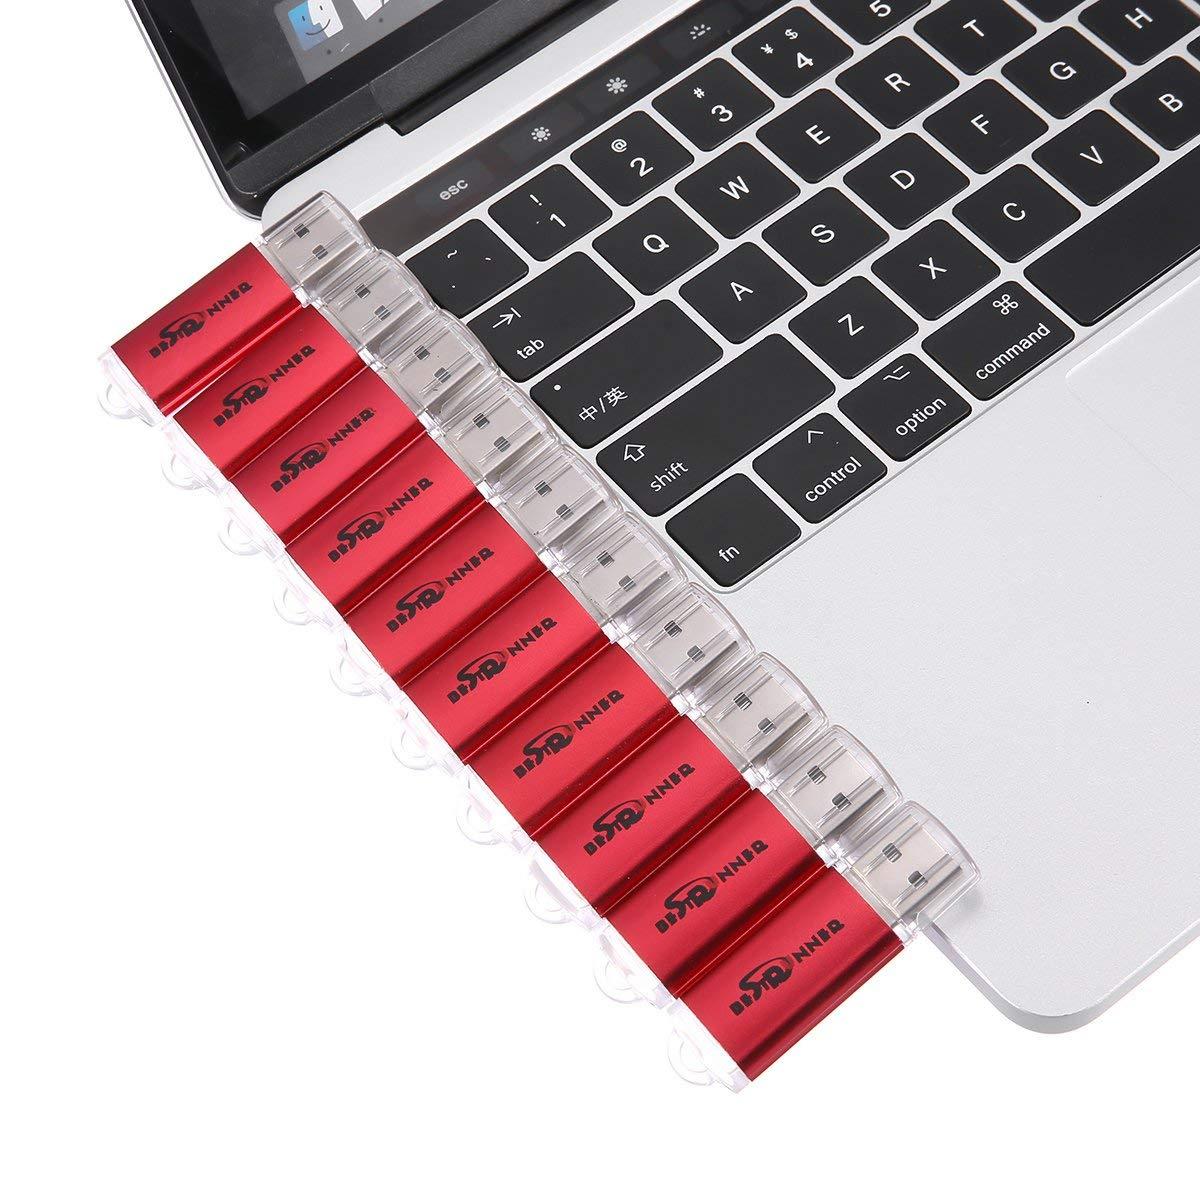 NOT 256GB BestRunner 10Pcs USB Flash Drive USB 2.0 Memory Stick Pen Drive USB Storage Thumb Stick 256MB Small Capacity Red